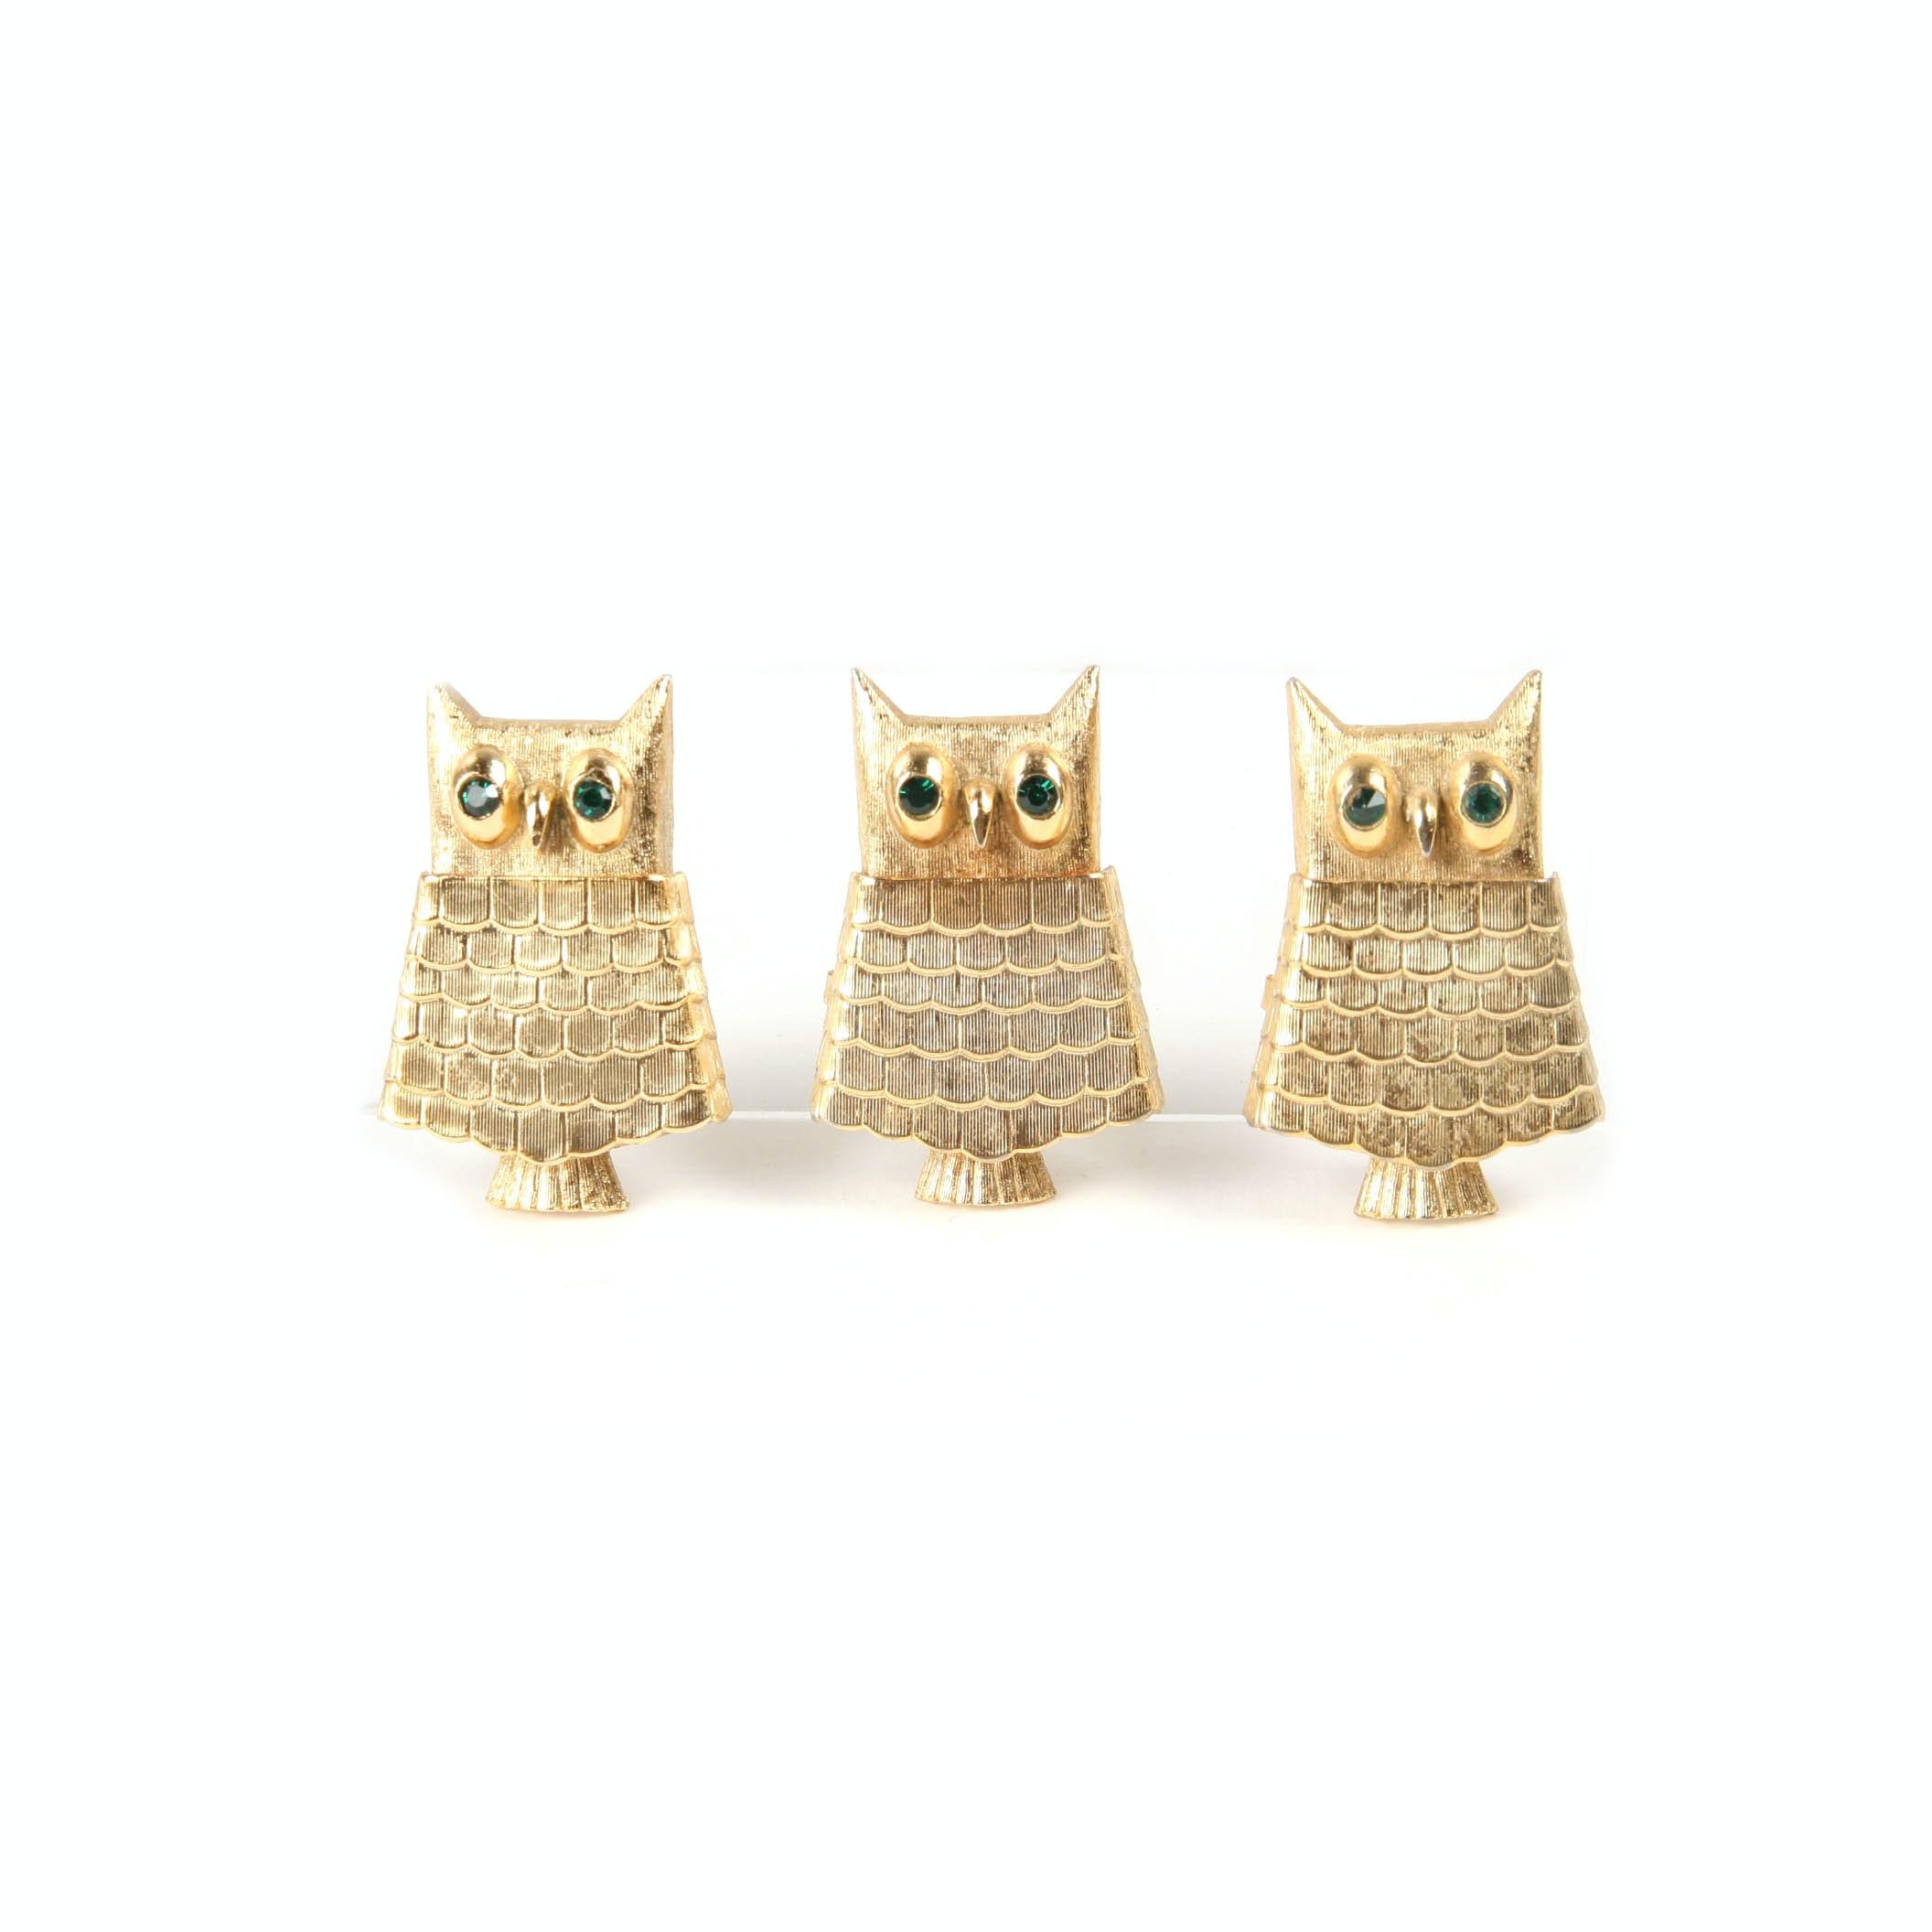 Three Vintage Collectible Avon Owl Perfume Brooches